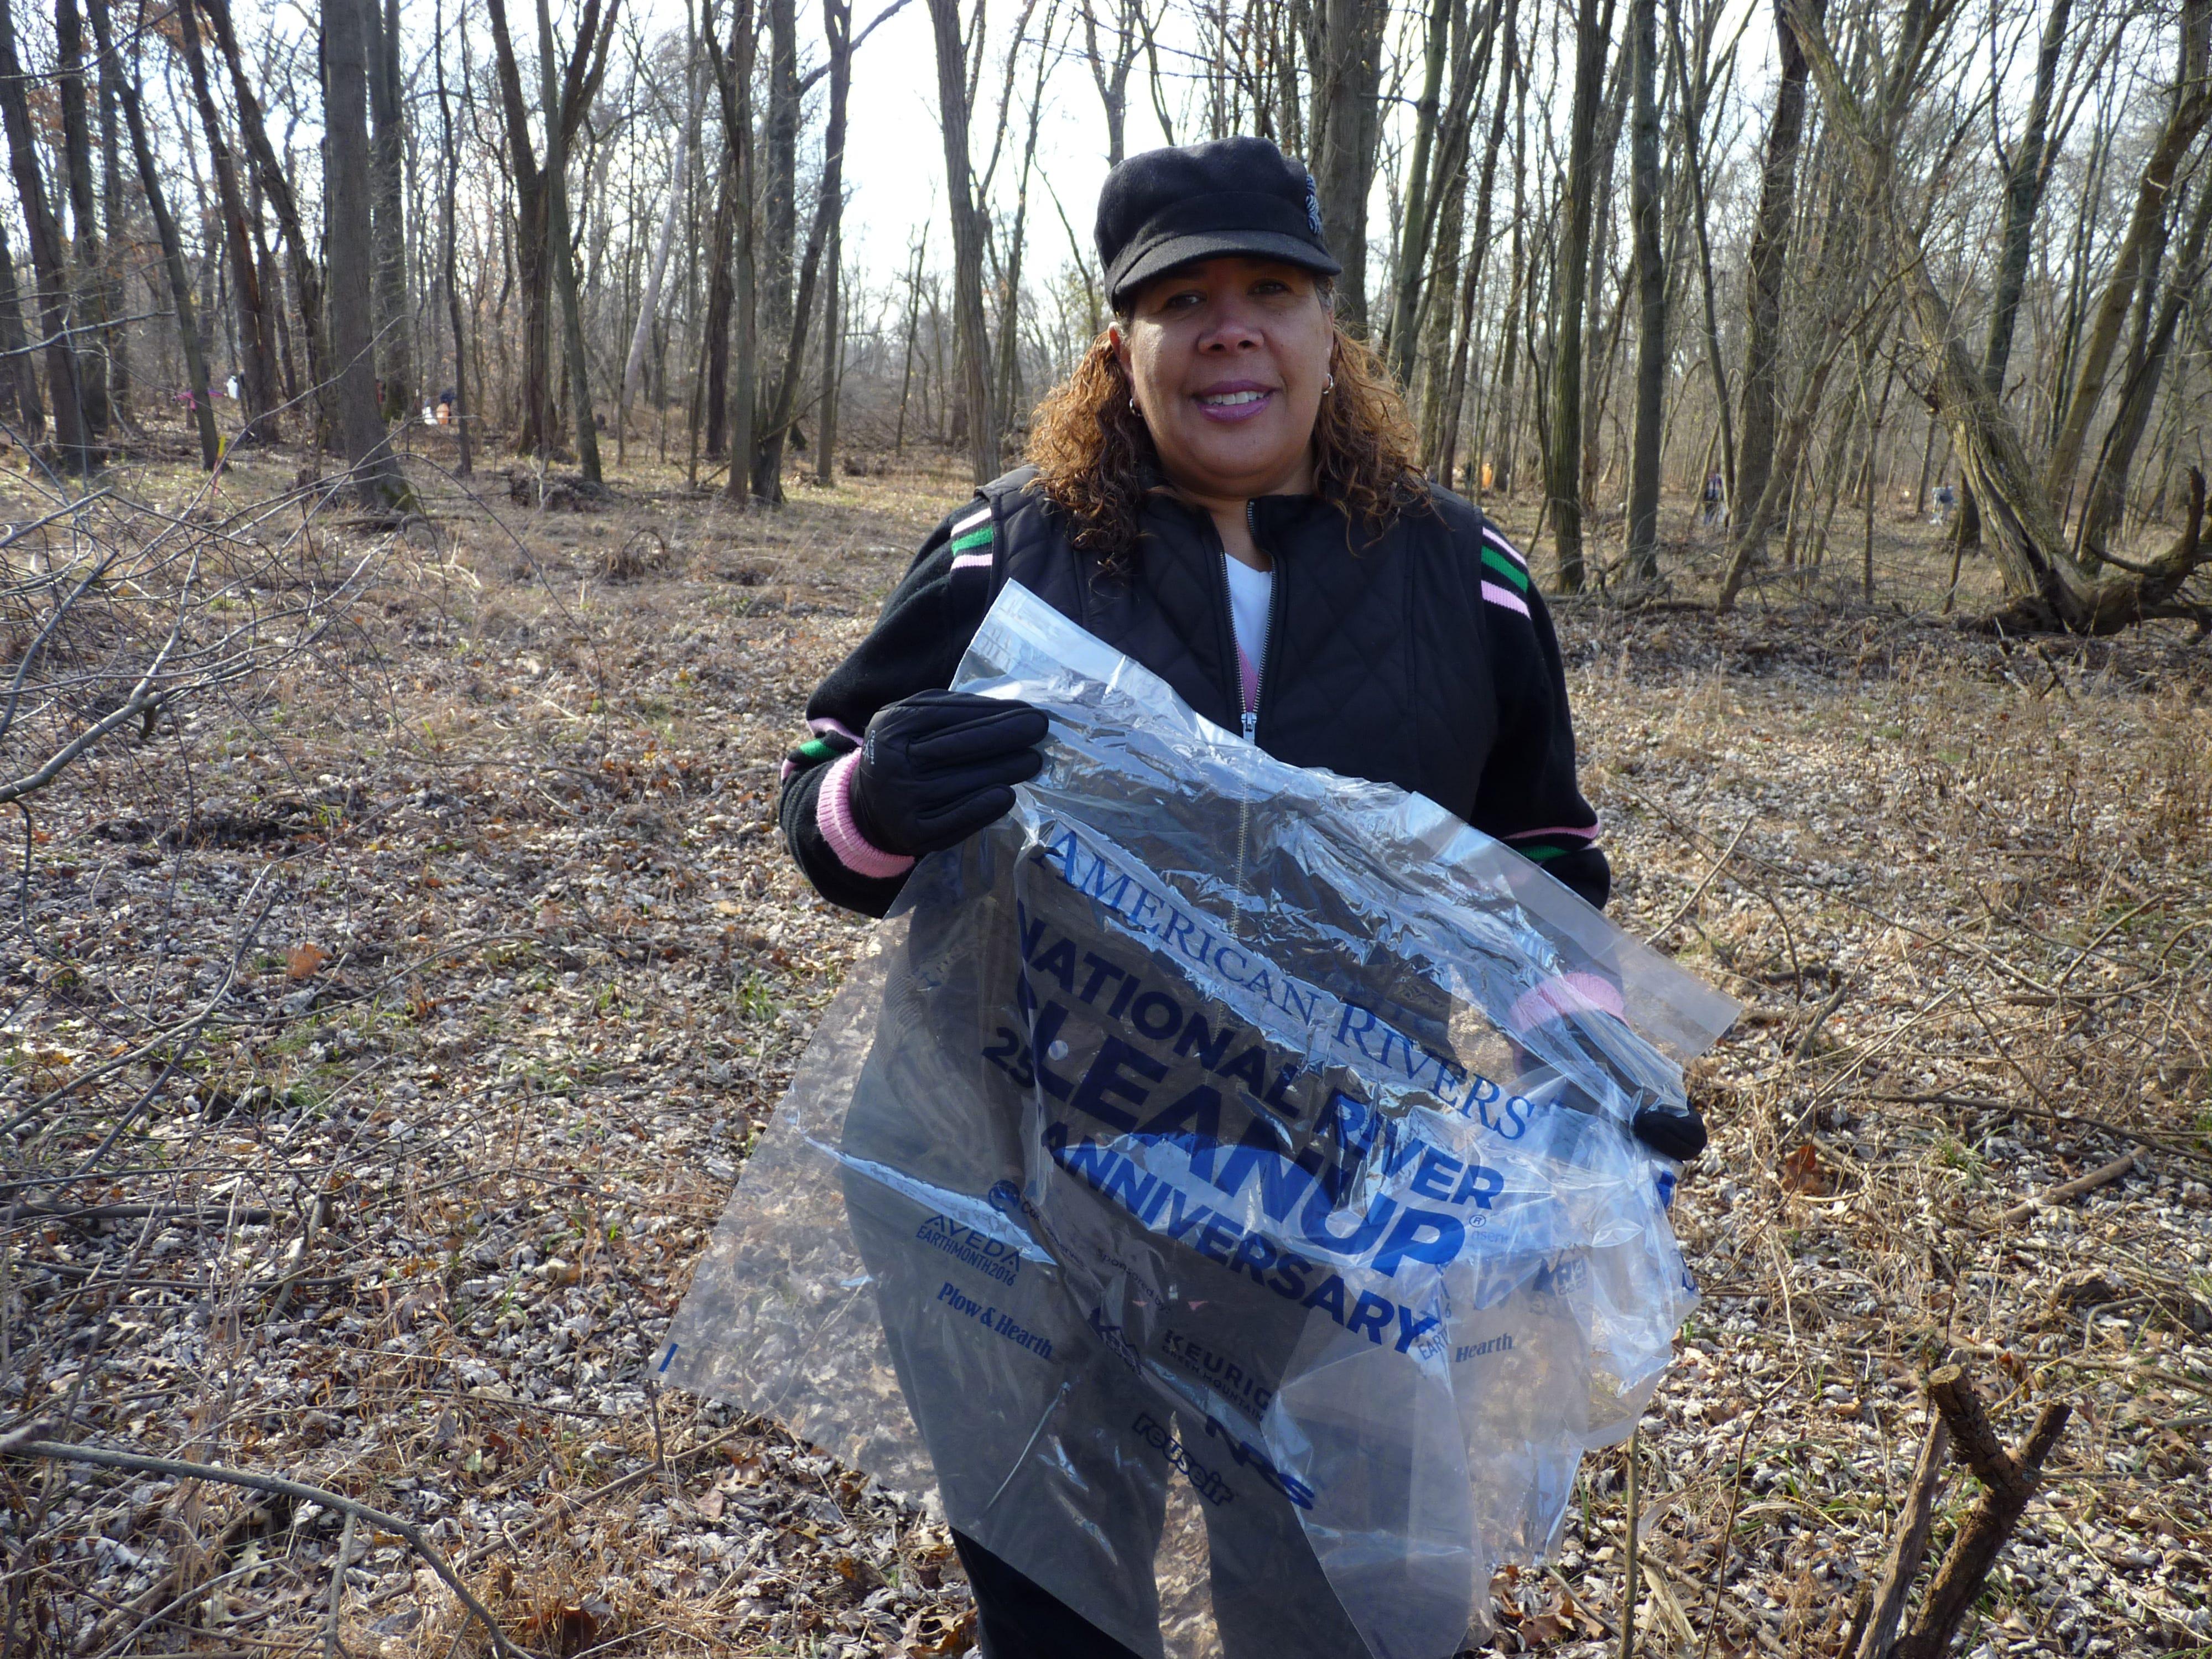 Assemblywoman Linda Carter volunteering at the Green Brook cleanup on Dec. 8, 2018.